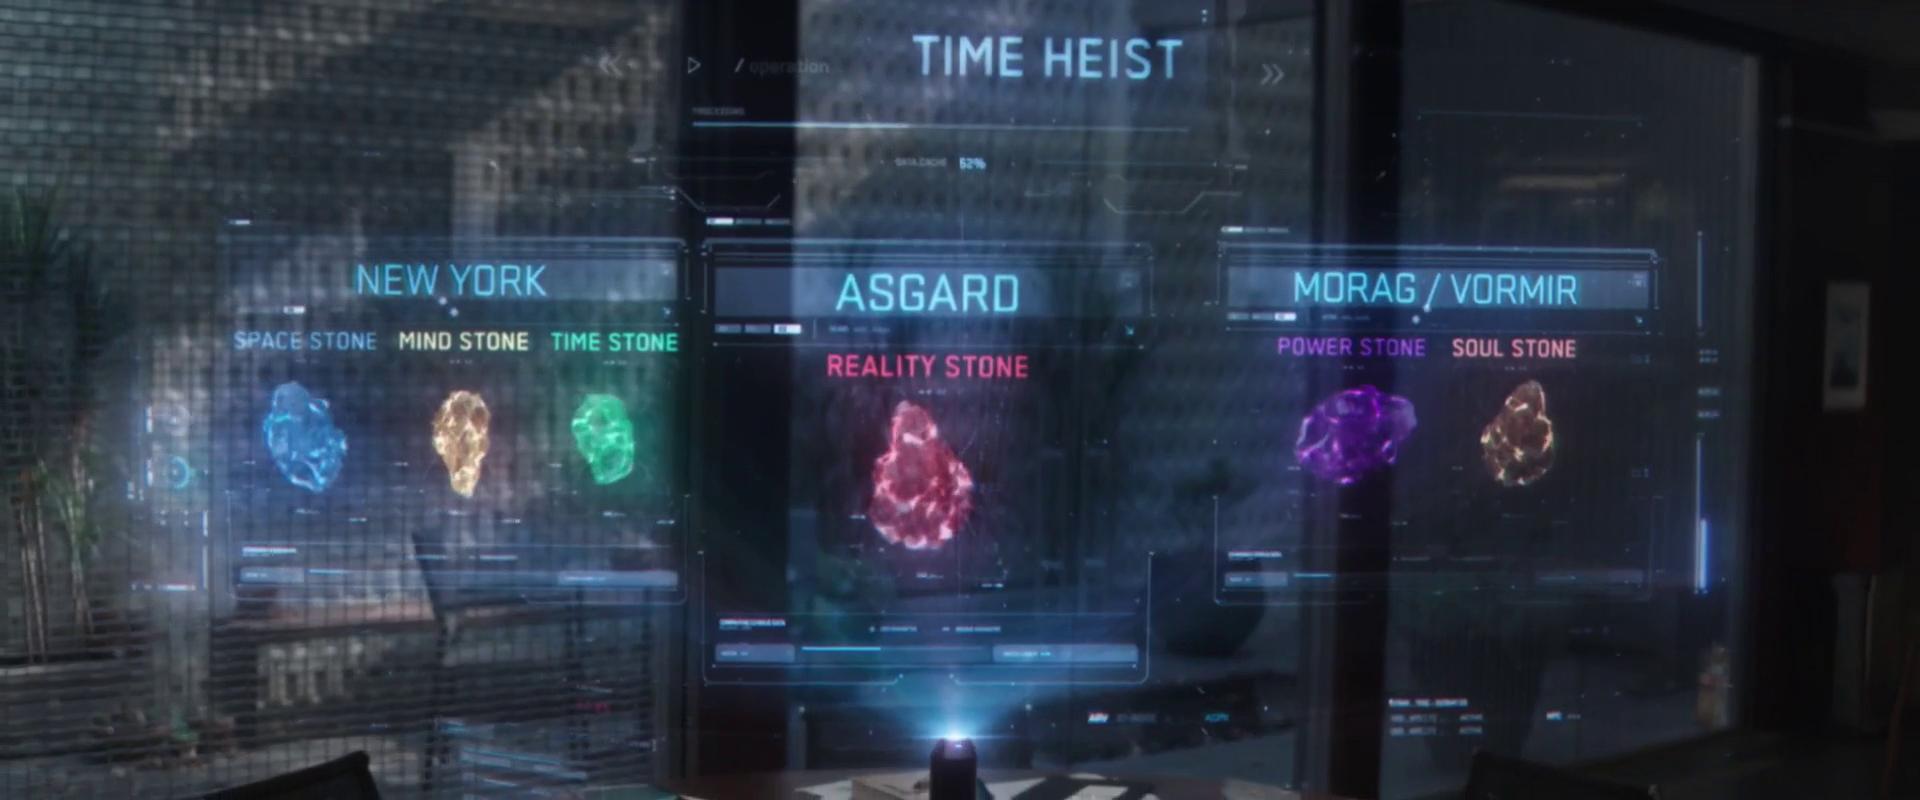 Time Heist | Marvel Cinematic Universe Wiki | Fandom